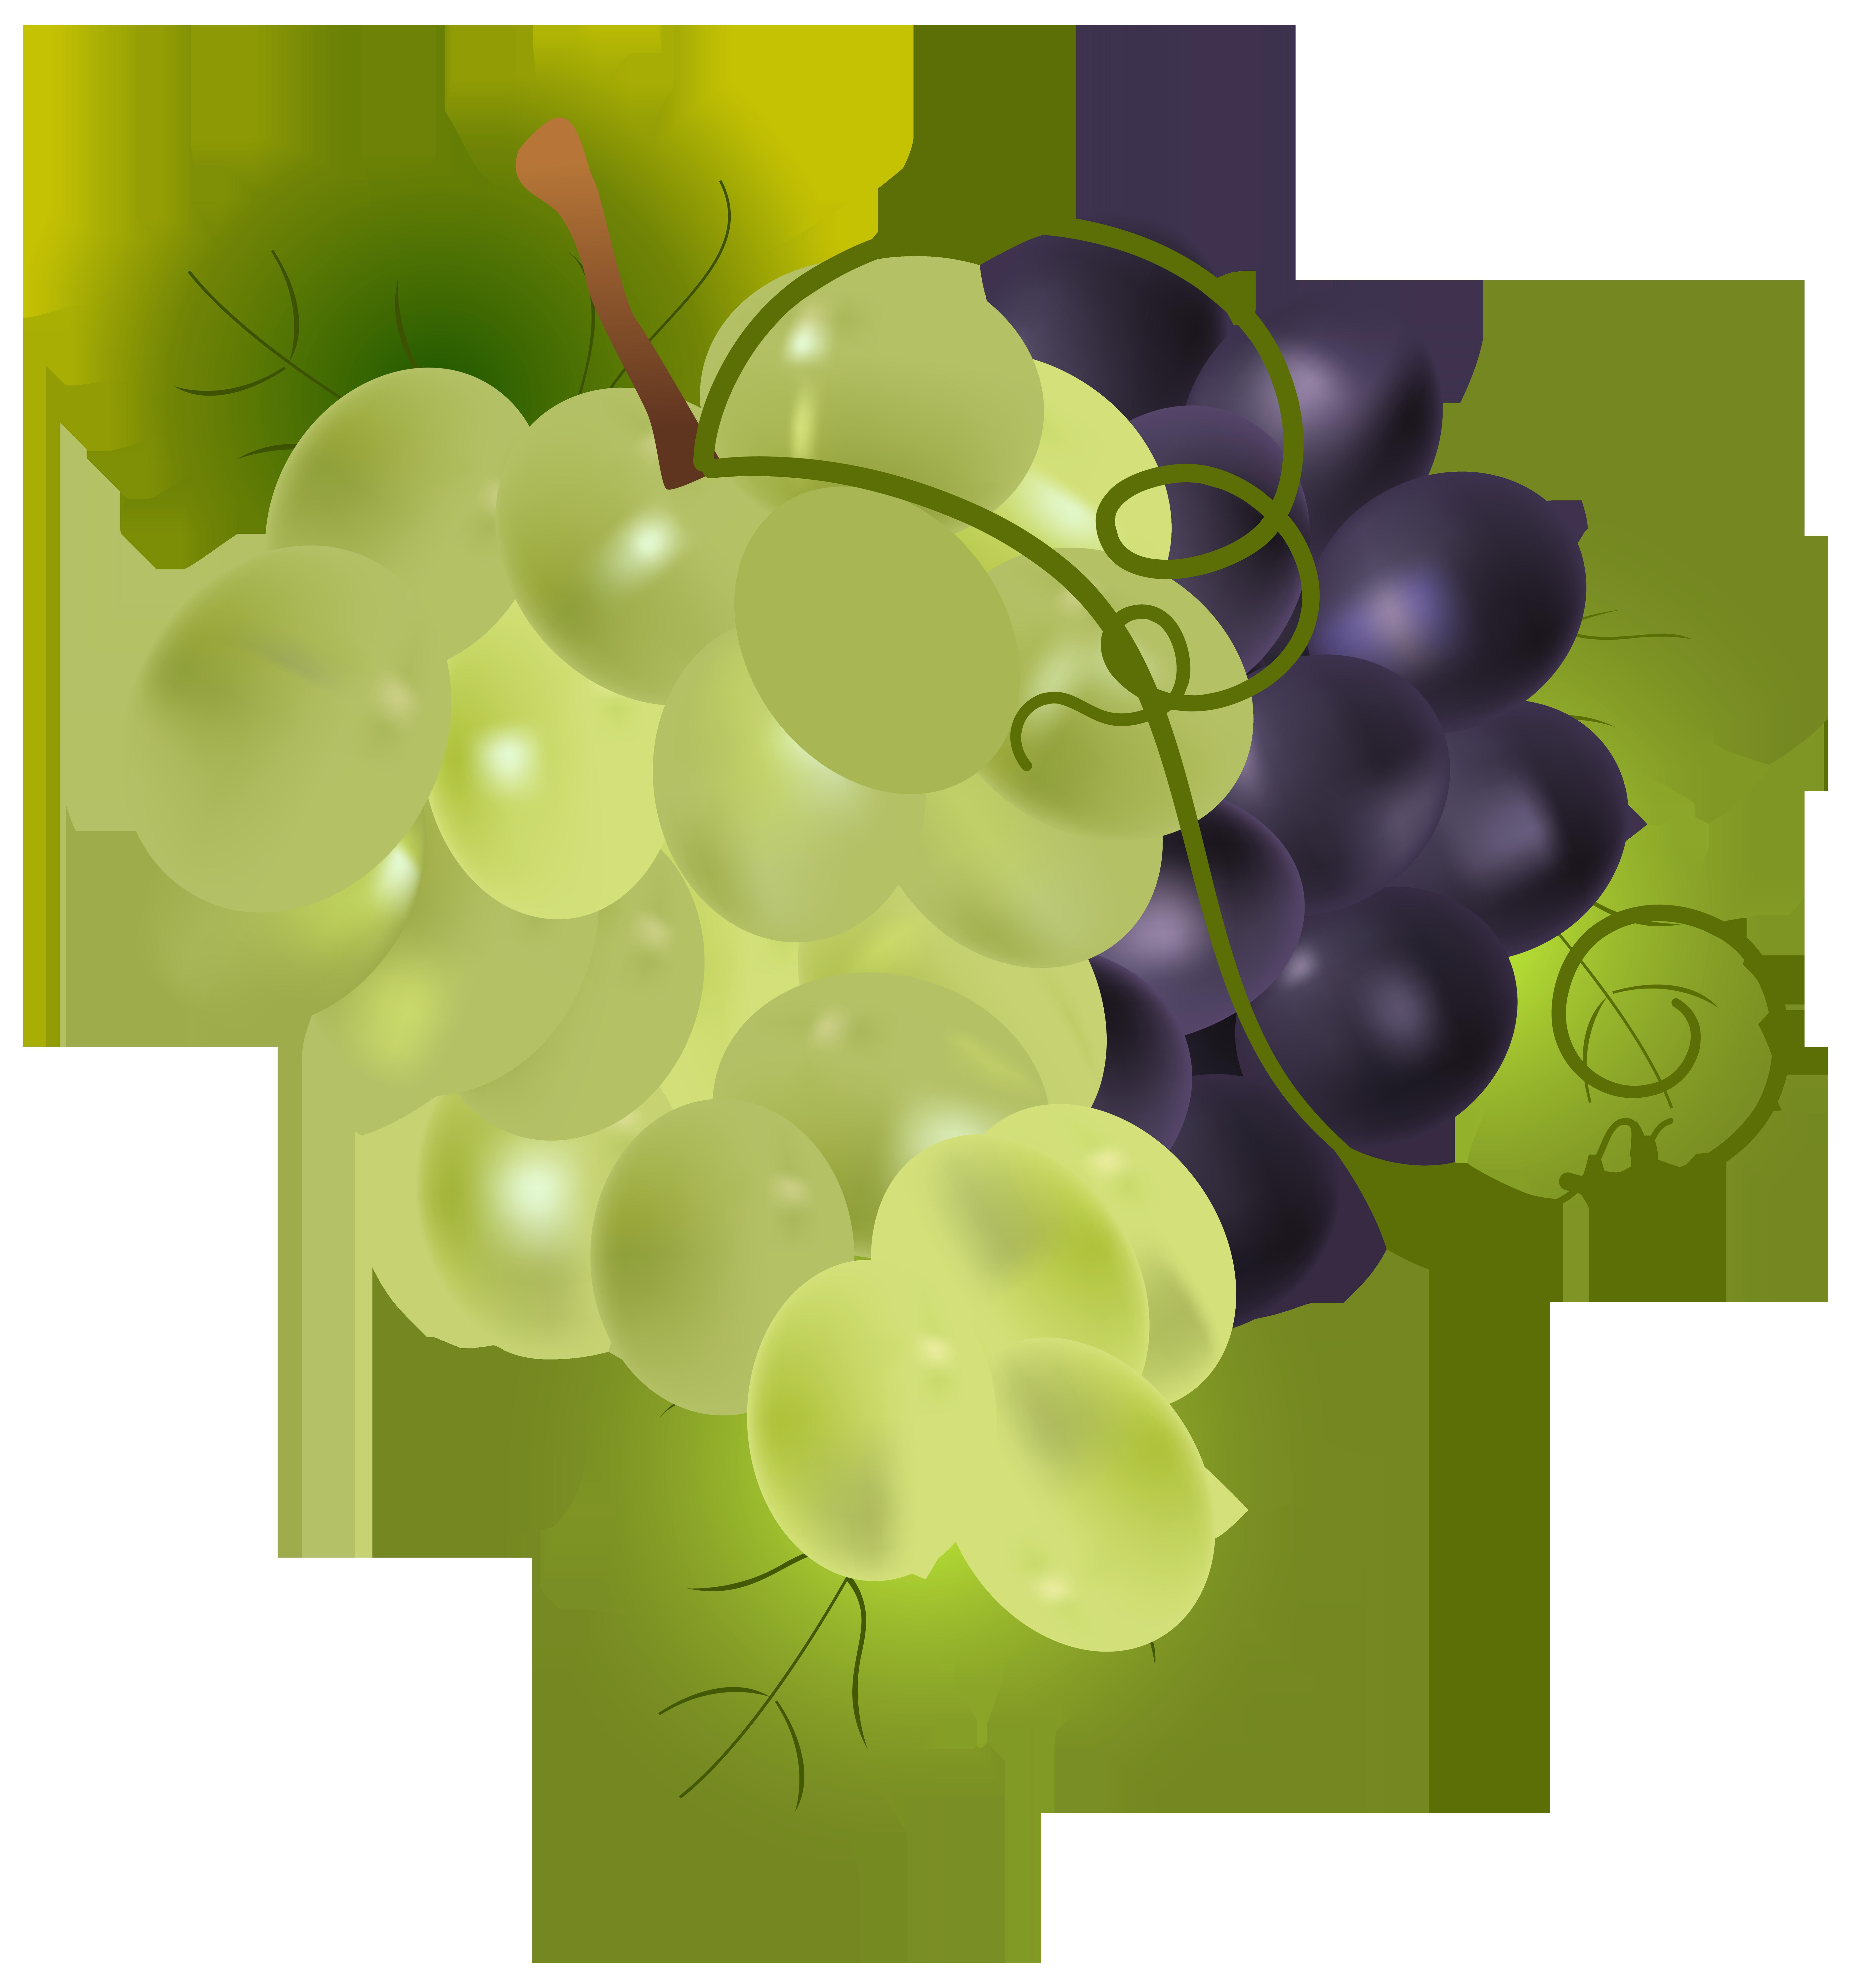 Grapes clipart illustration. Png clip art image